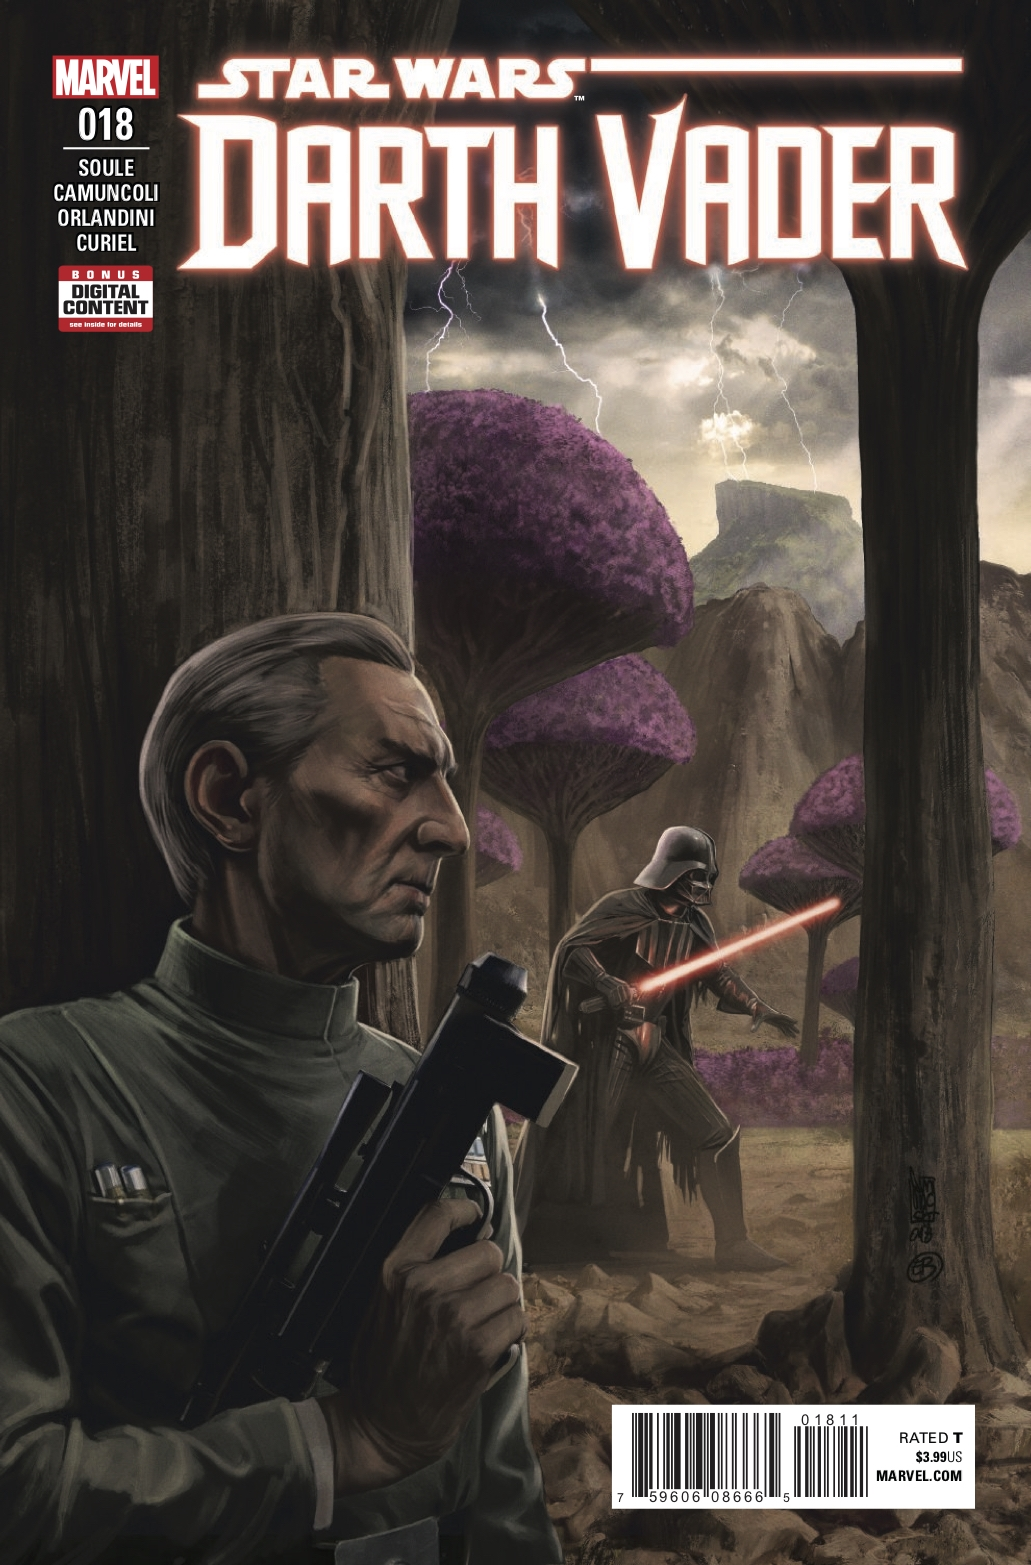 Darth_Vader_Dark_Lord_of_the_Sith_18.jpg